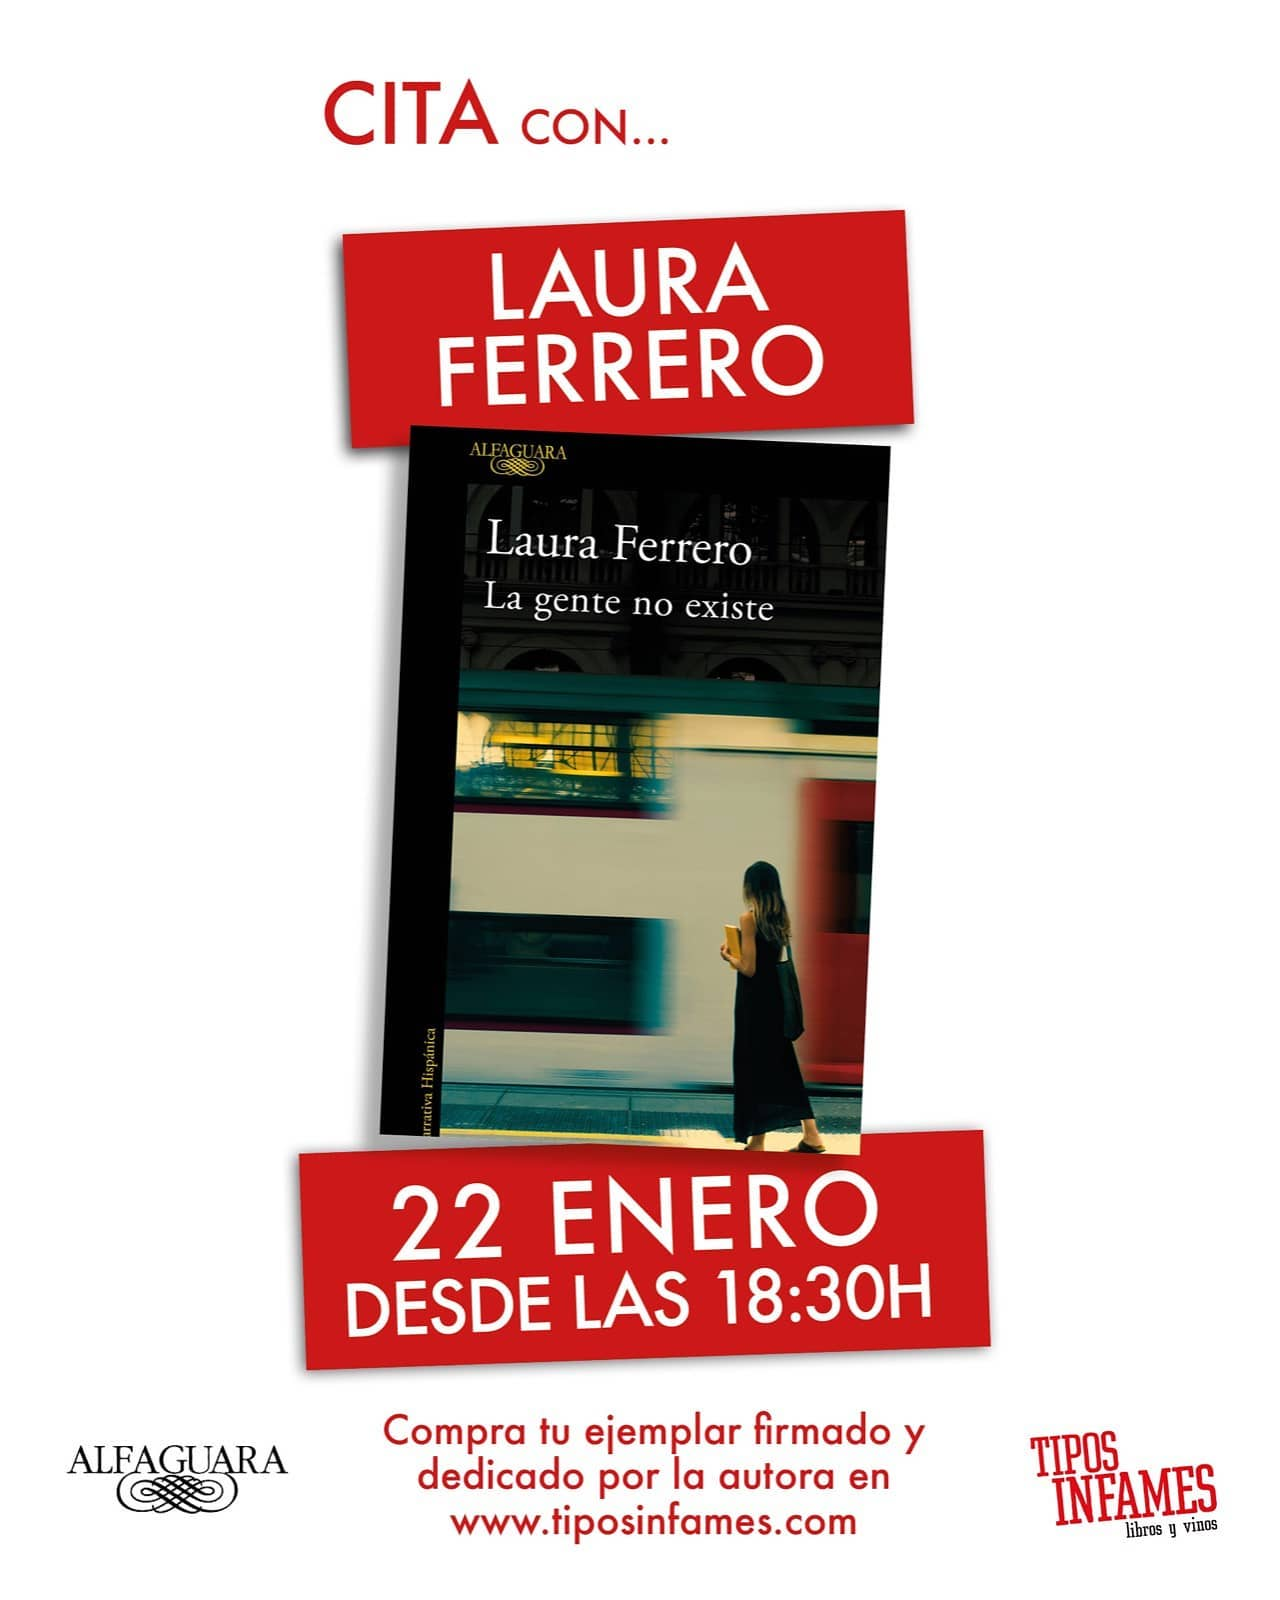 Cita con Laura Ferrero